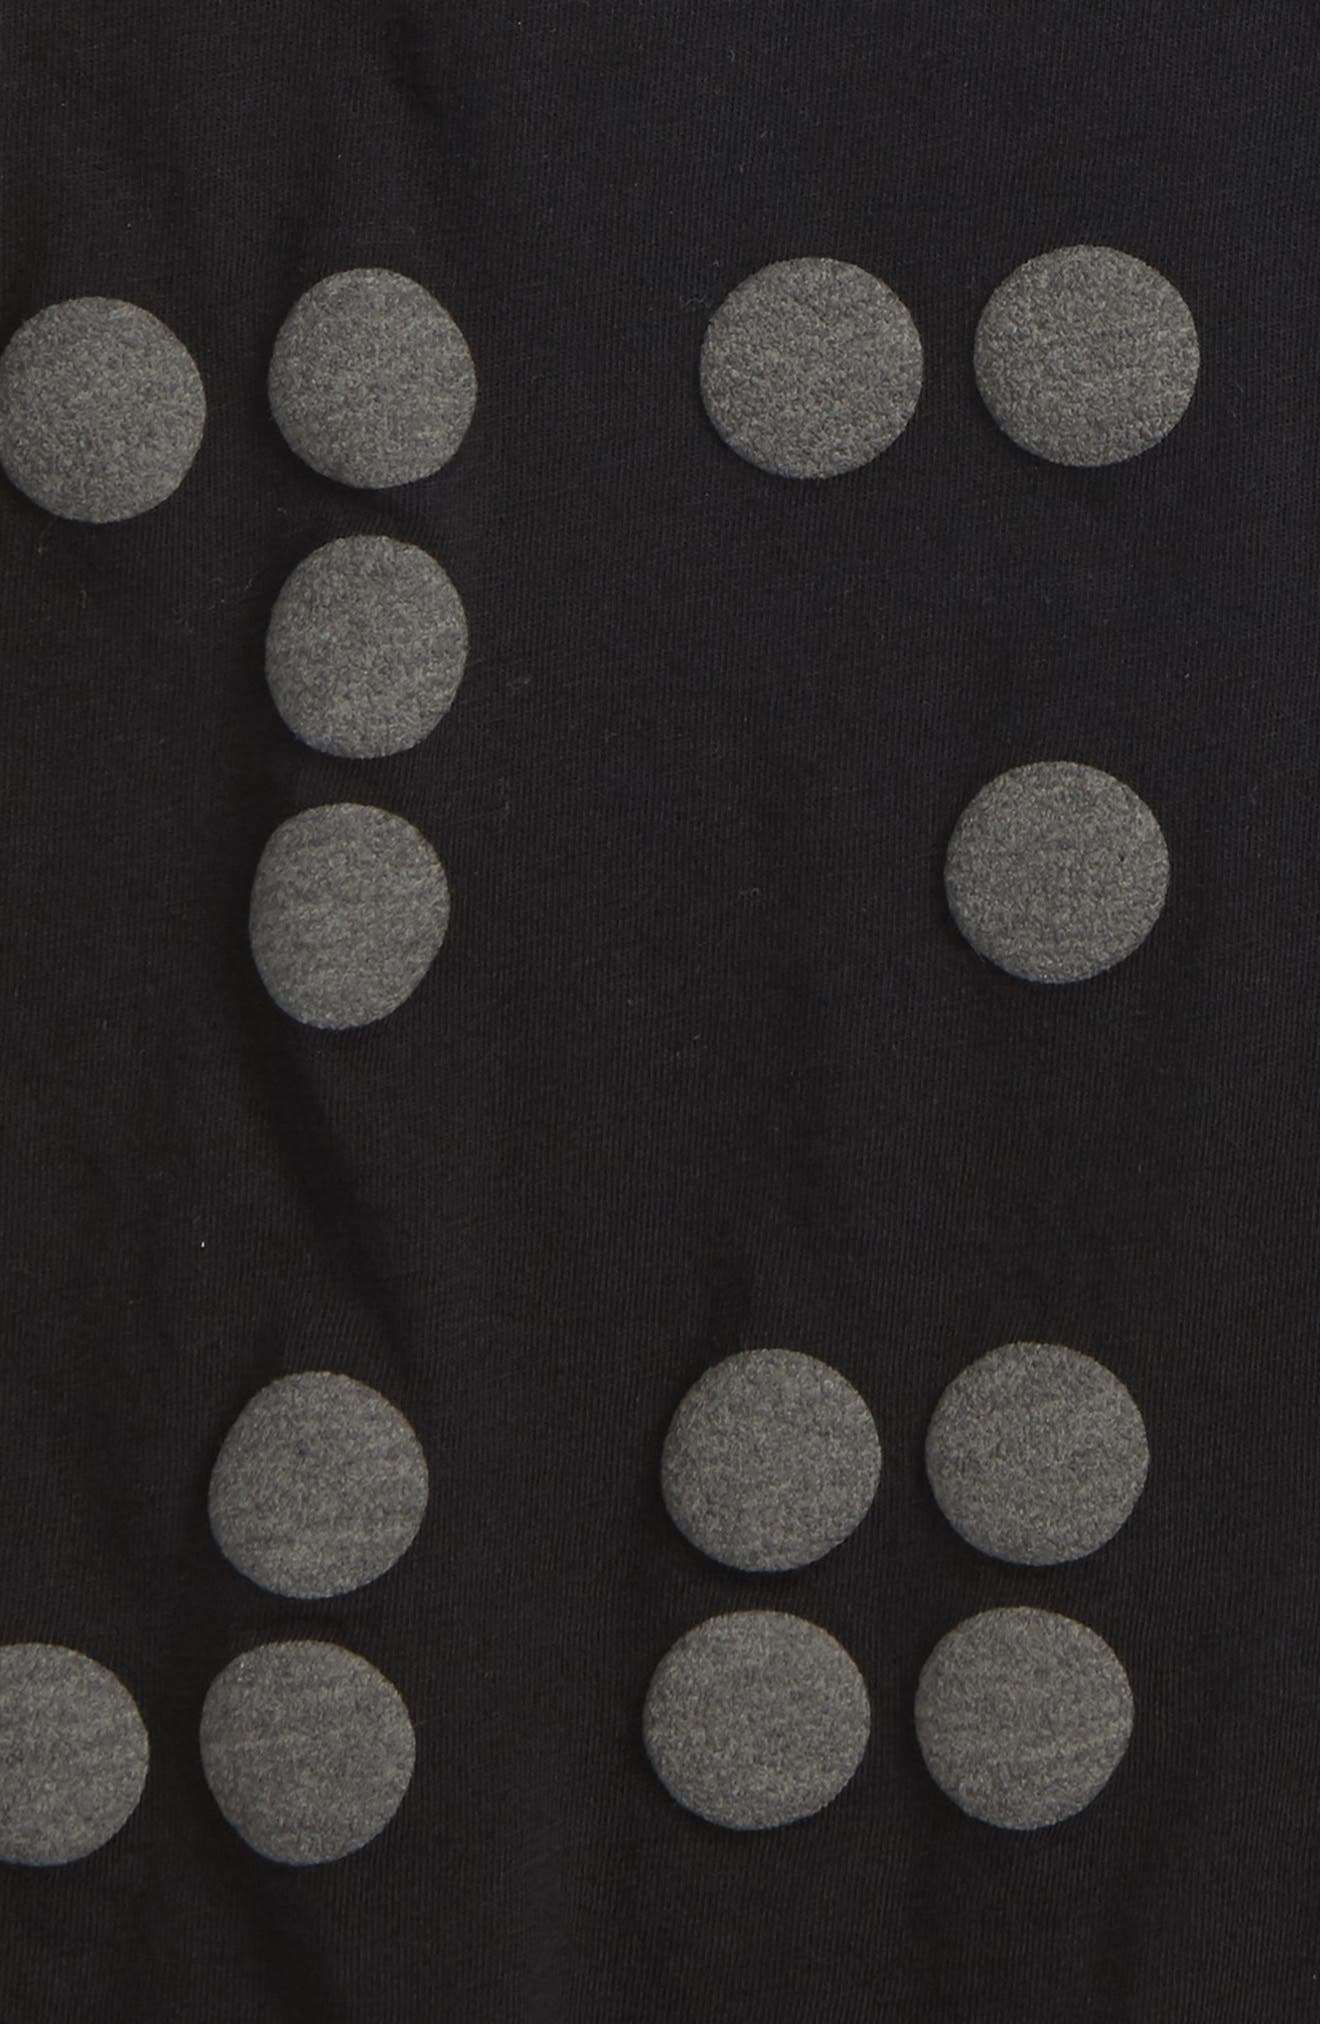 Braille Dot Tank,                             Alternate thumbnail 2, color,                             Black